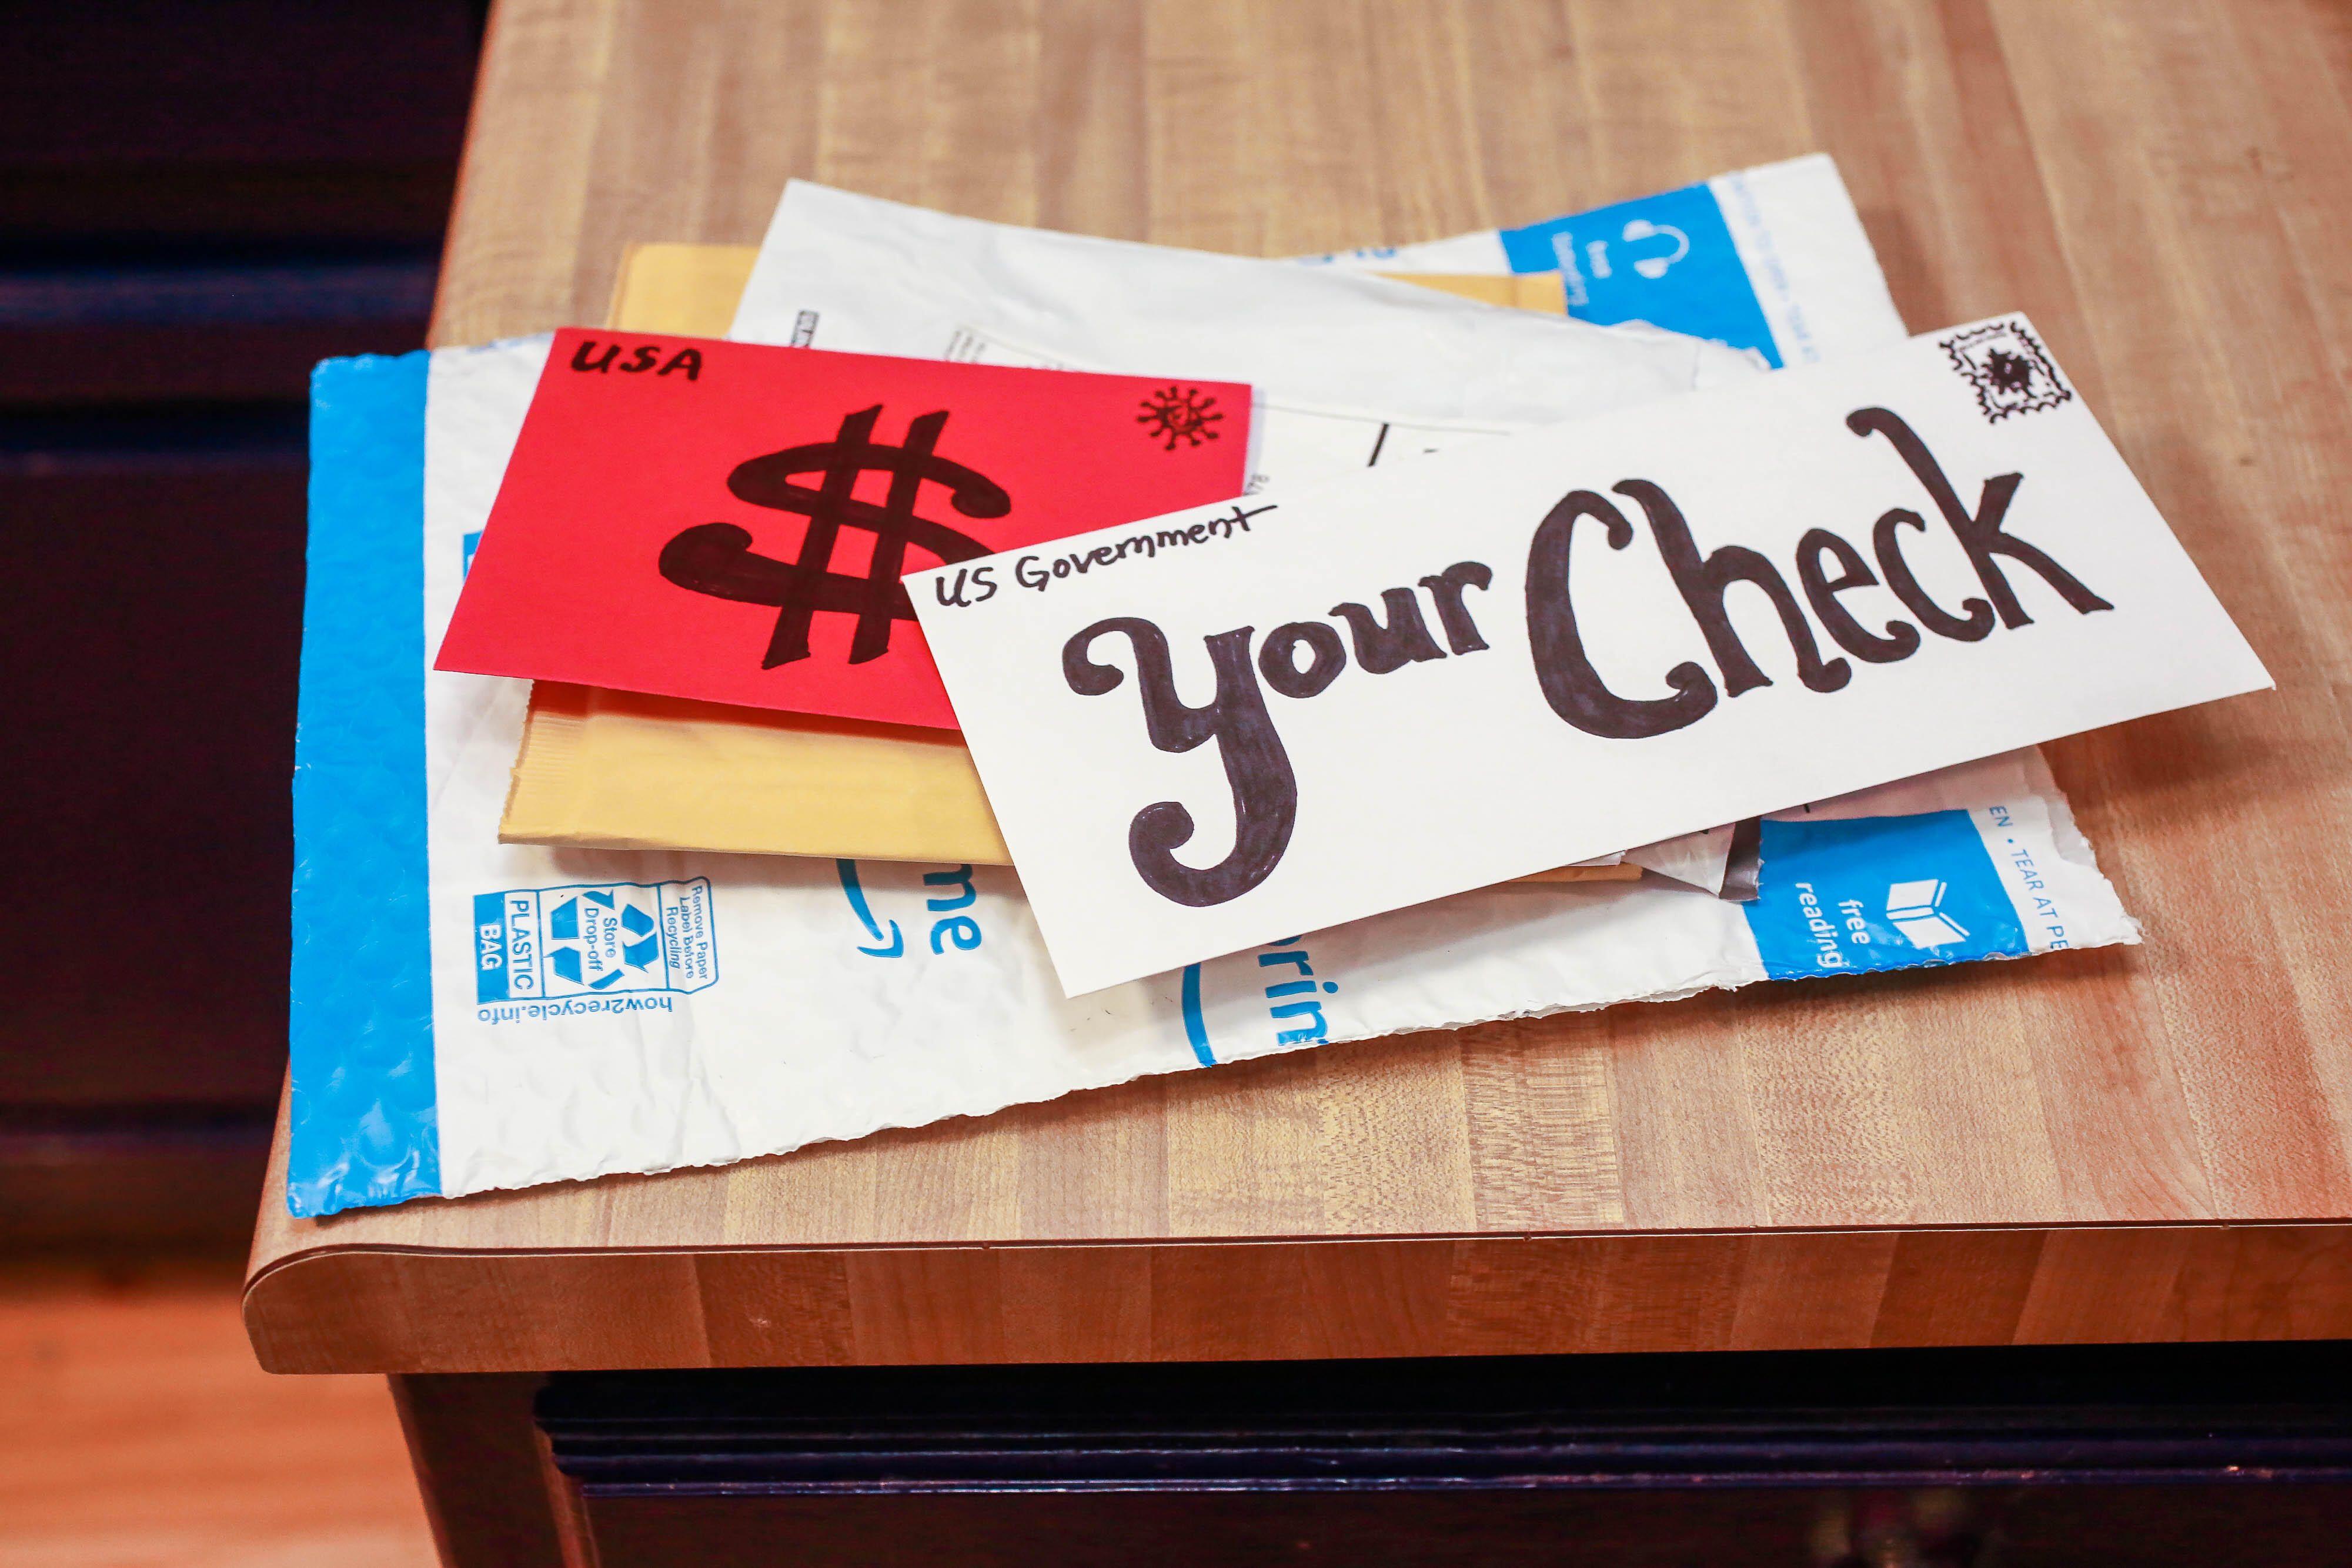 Trigger-check-us-mail-envelope-money-2020012